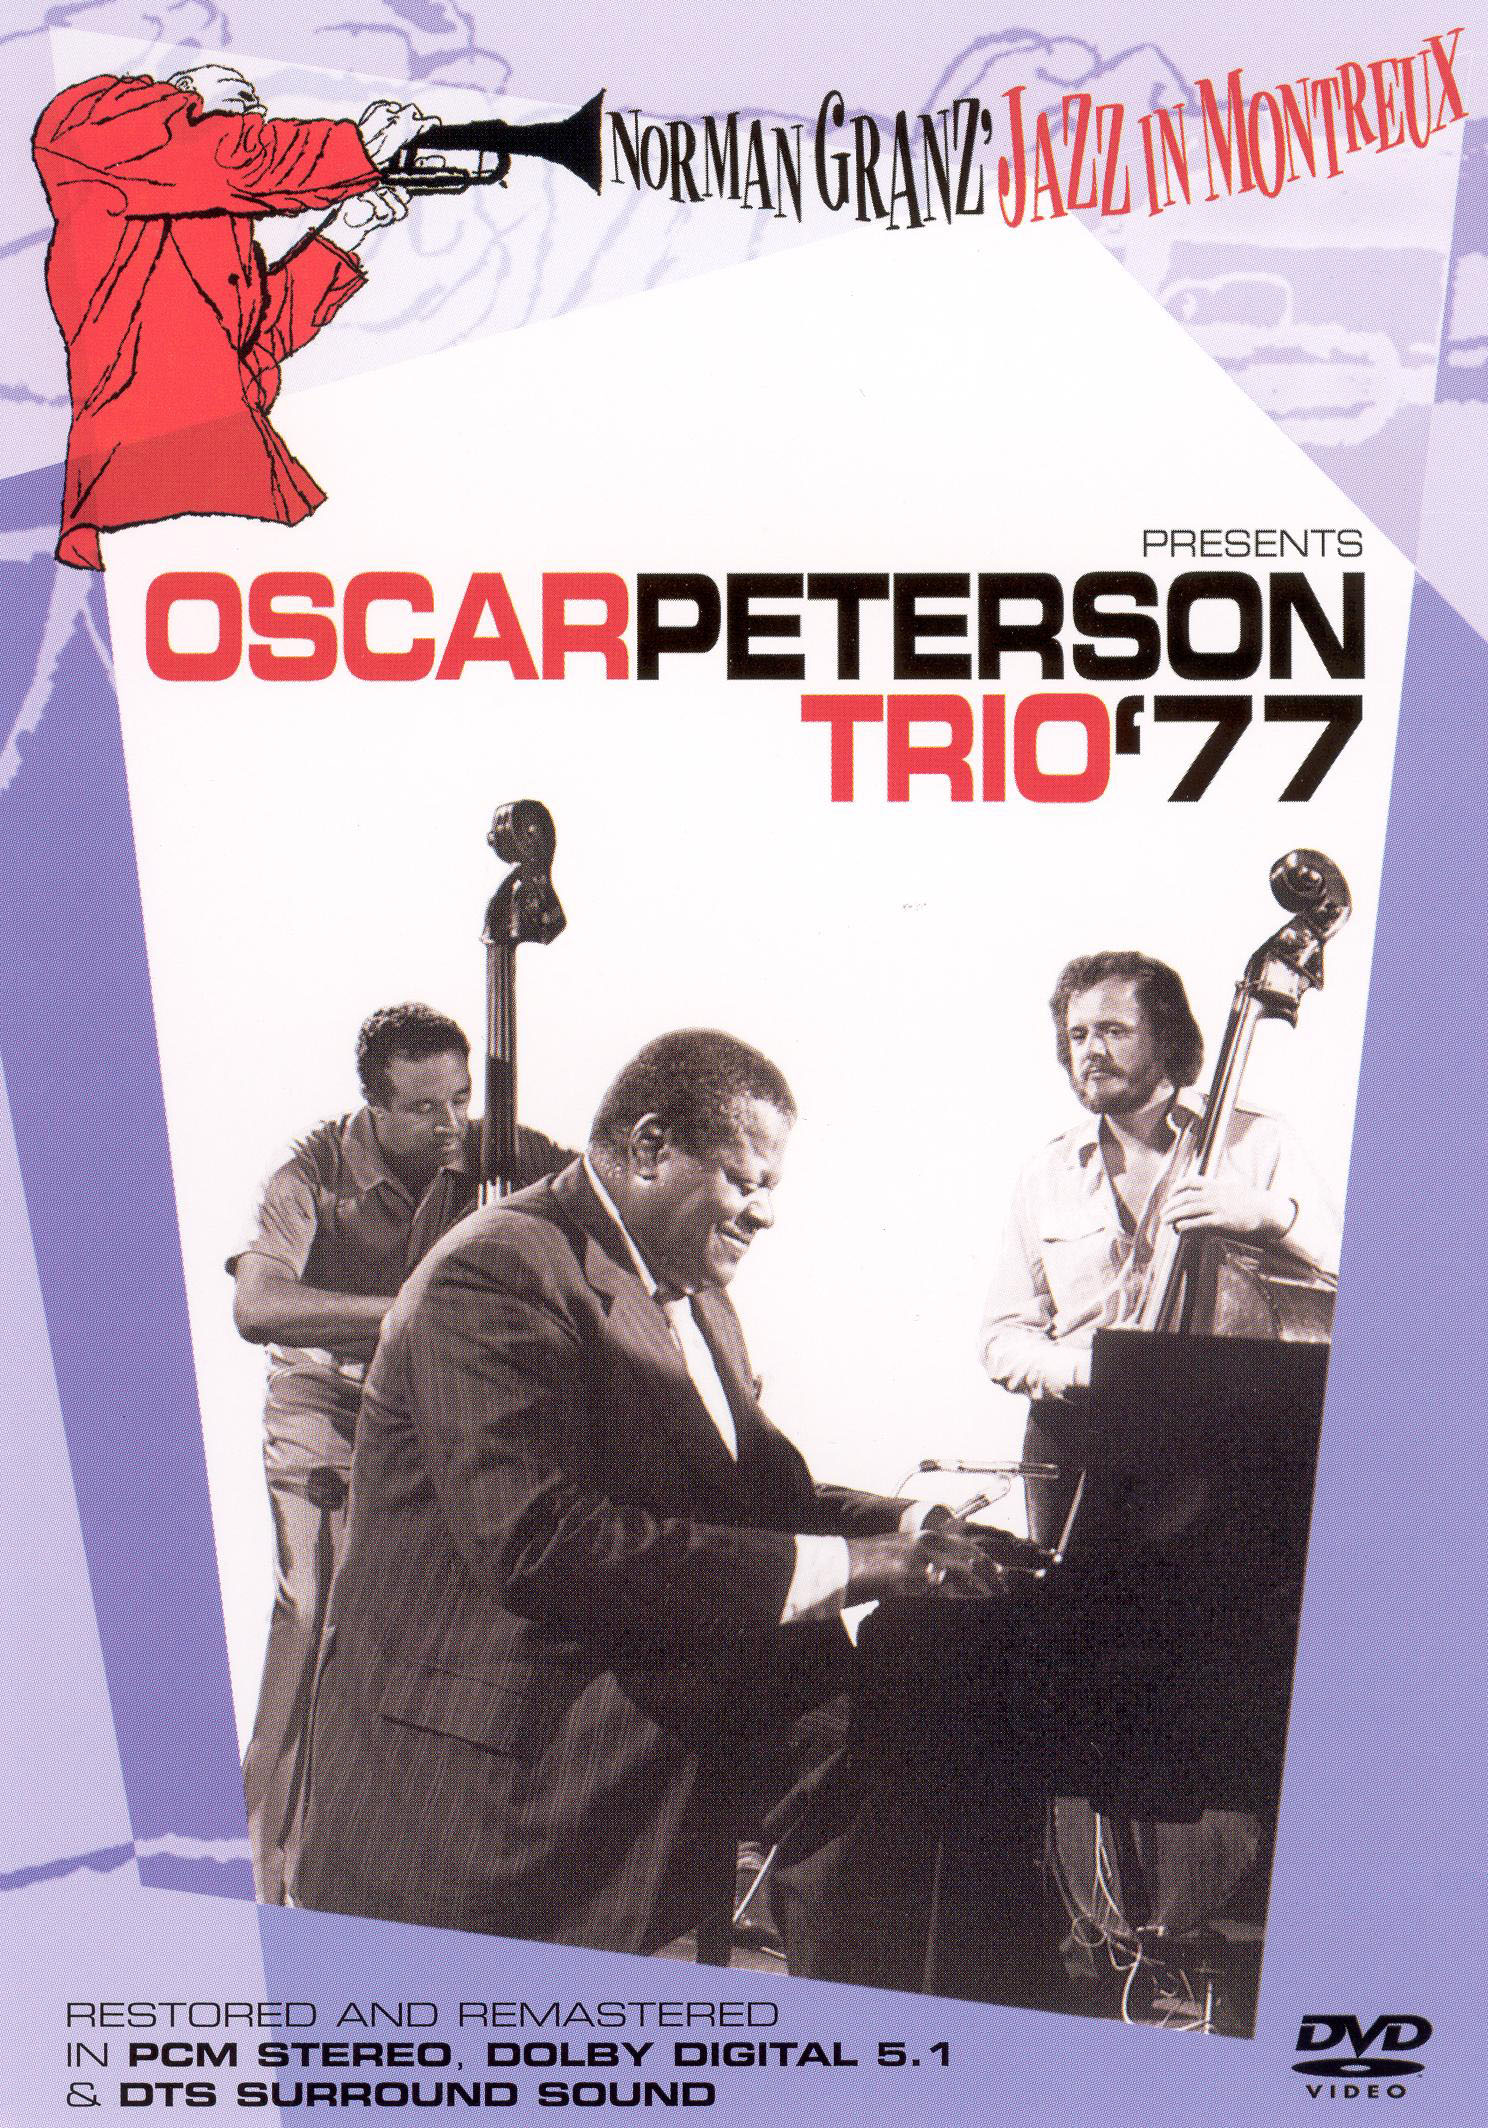 Norman Granz' Jazz in Montreux: Oscar Peterson Trio '77